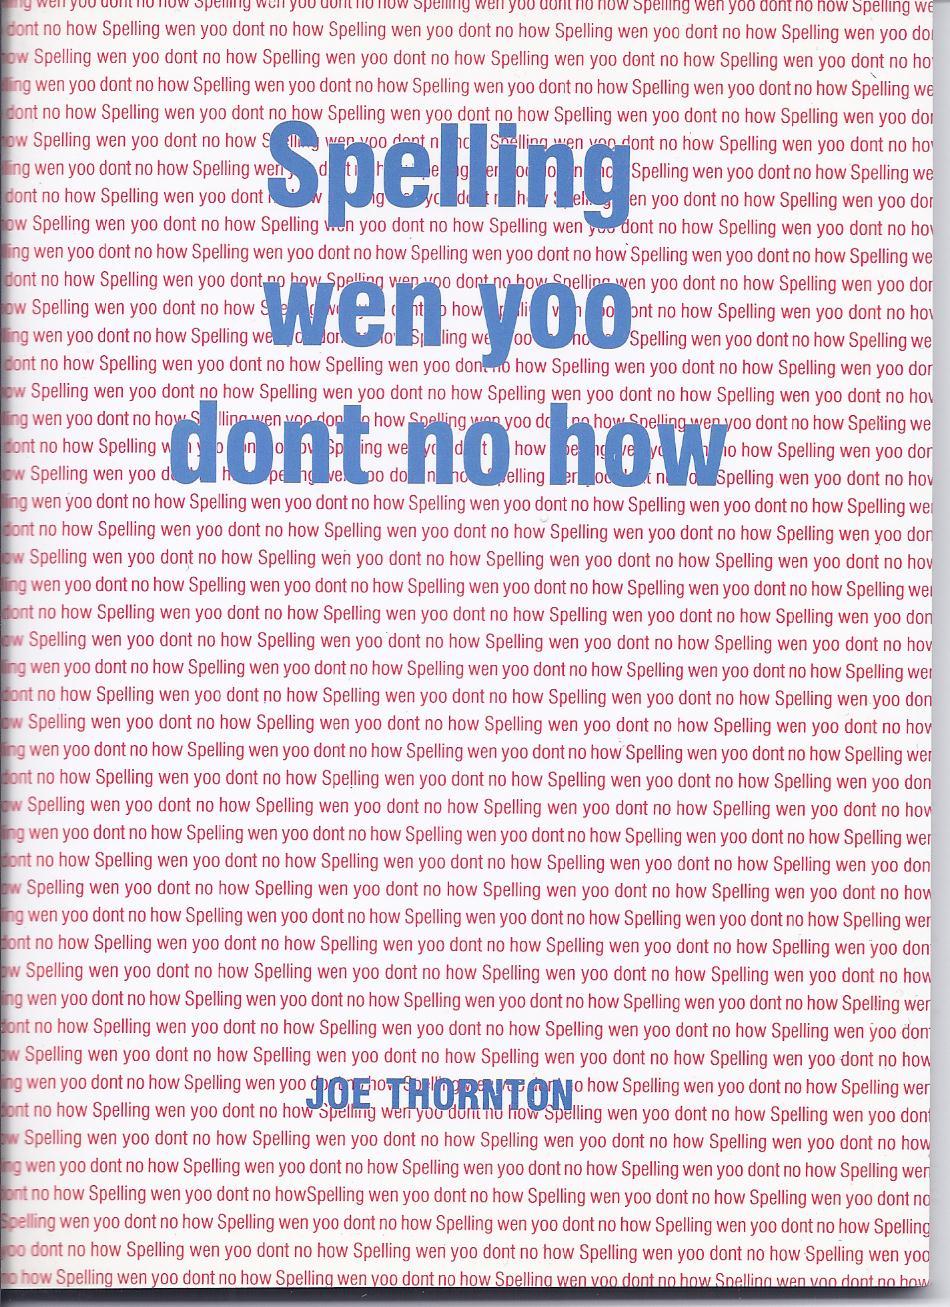 Spelling Wen Yoo Dont No How-0